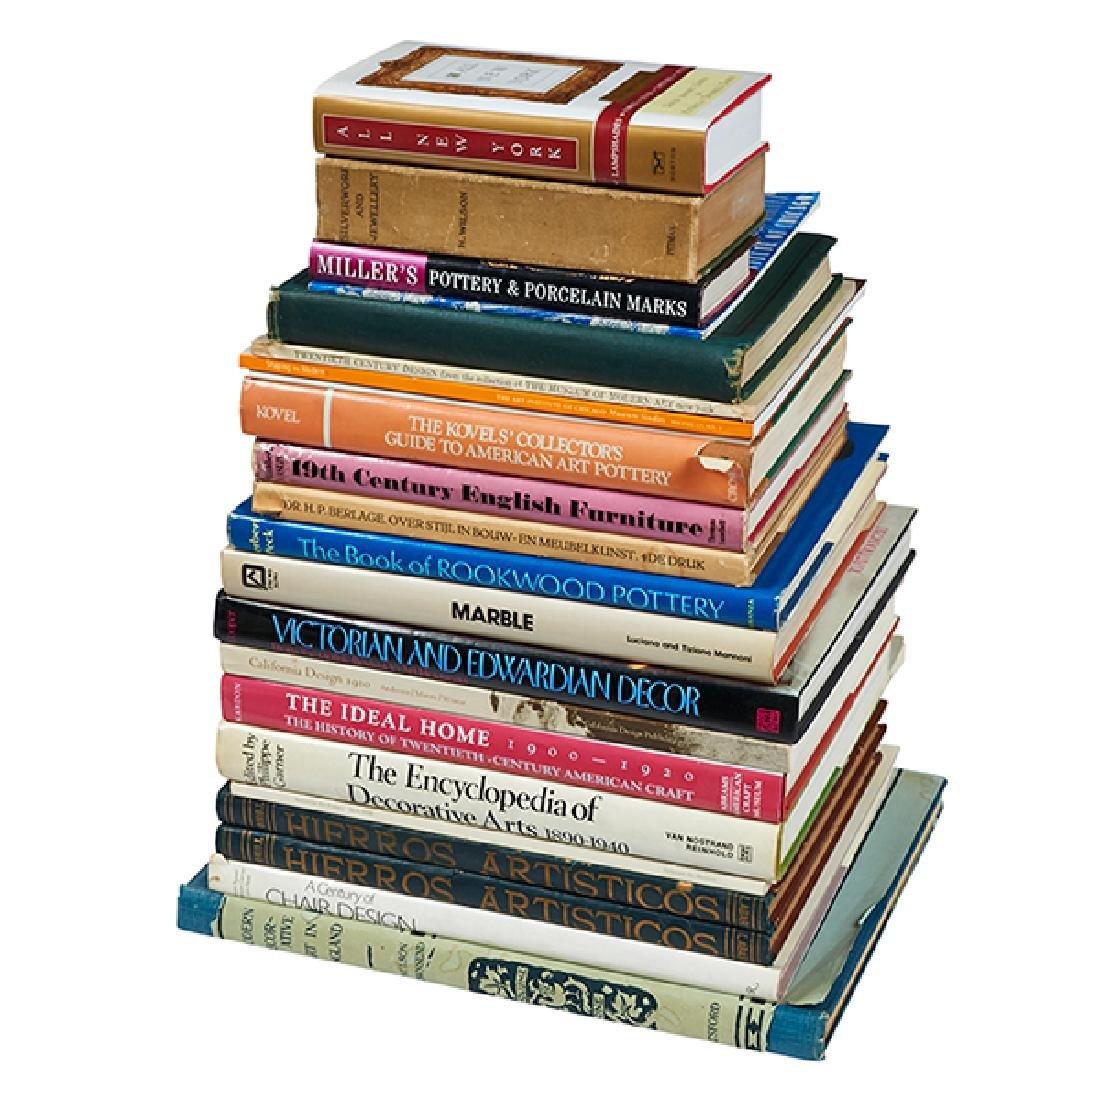 Various Authors, pertaining to decorative arts,